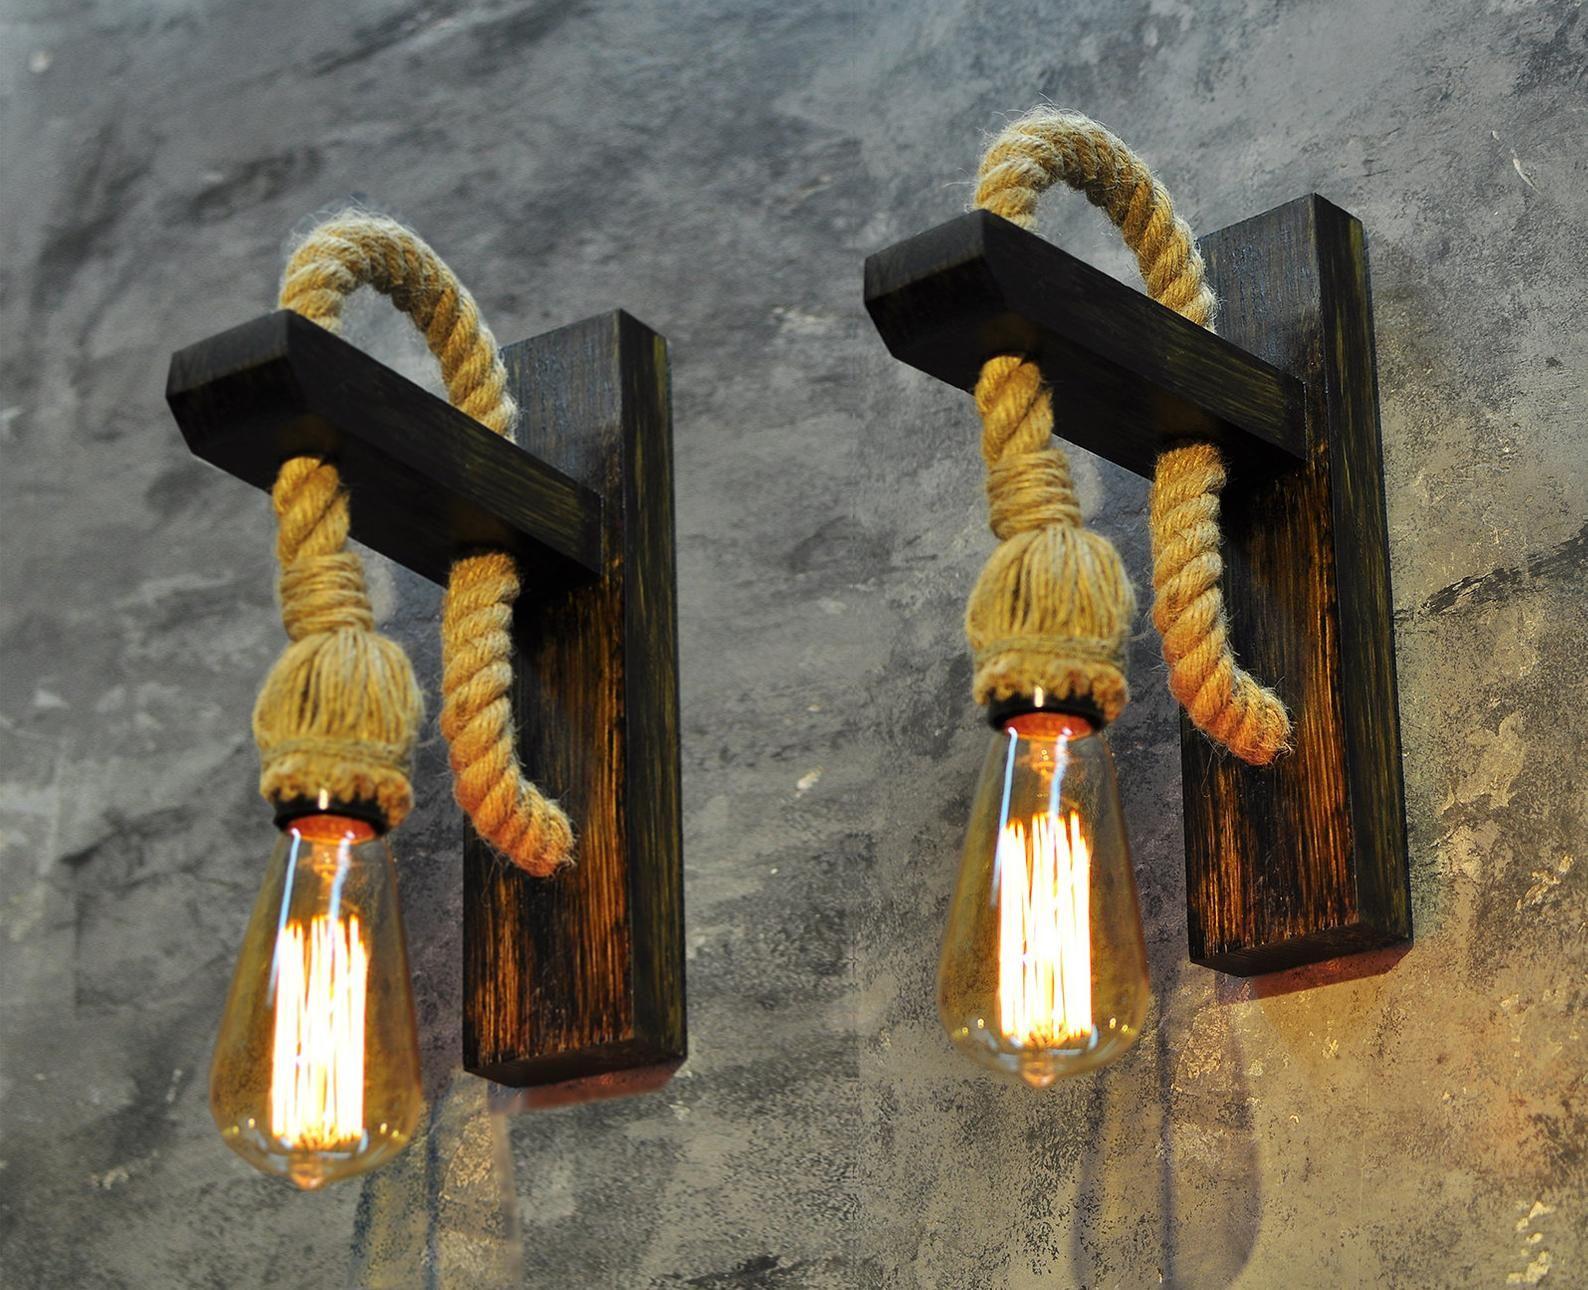 Satz Von 2 Holz Lampen Mit Seil Schnur Wand Edison Stellt Sich Etsy In 2020 Wooden Pendant Lighting Rustic Light Fixtures Rustic Wall Lighting